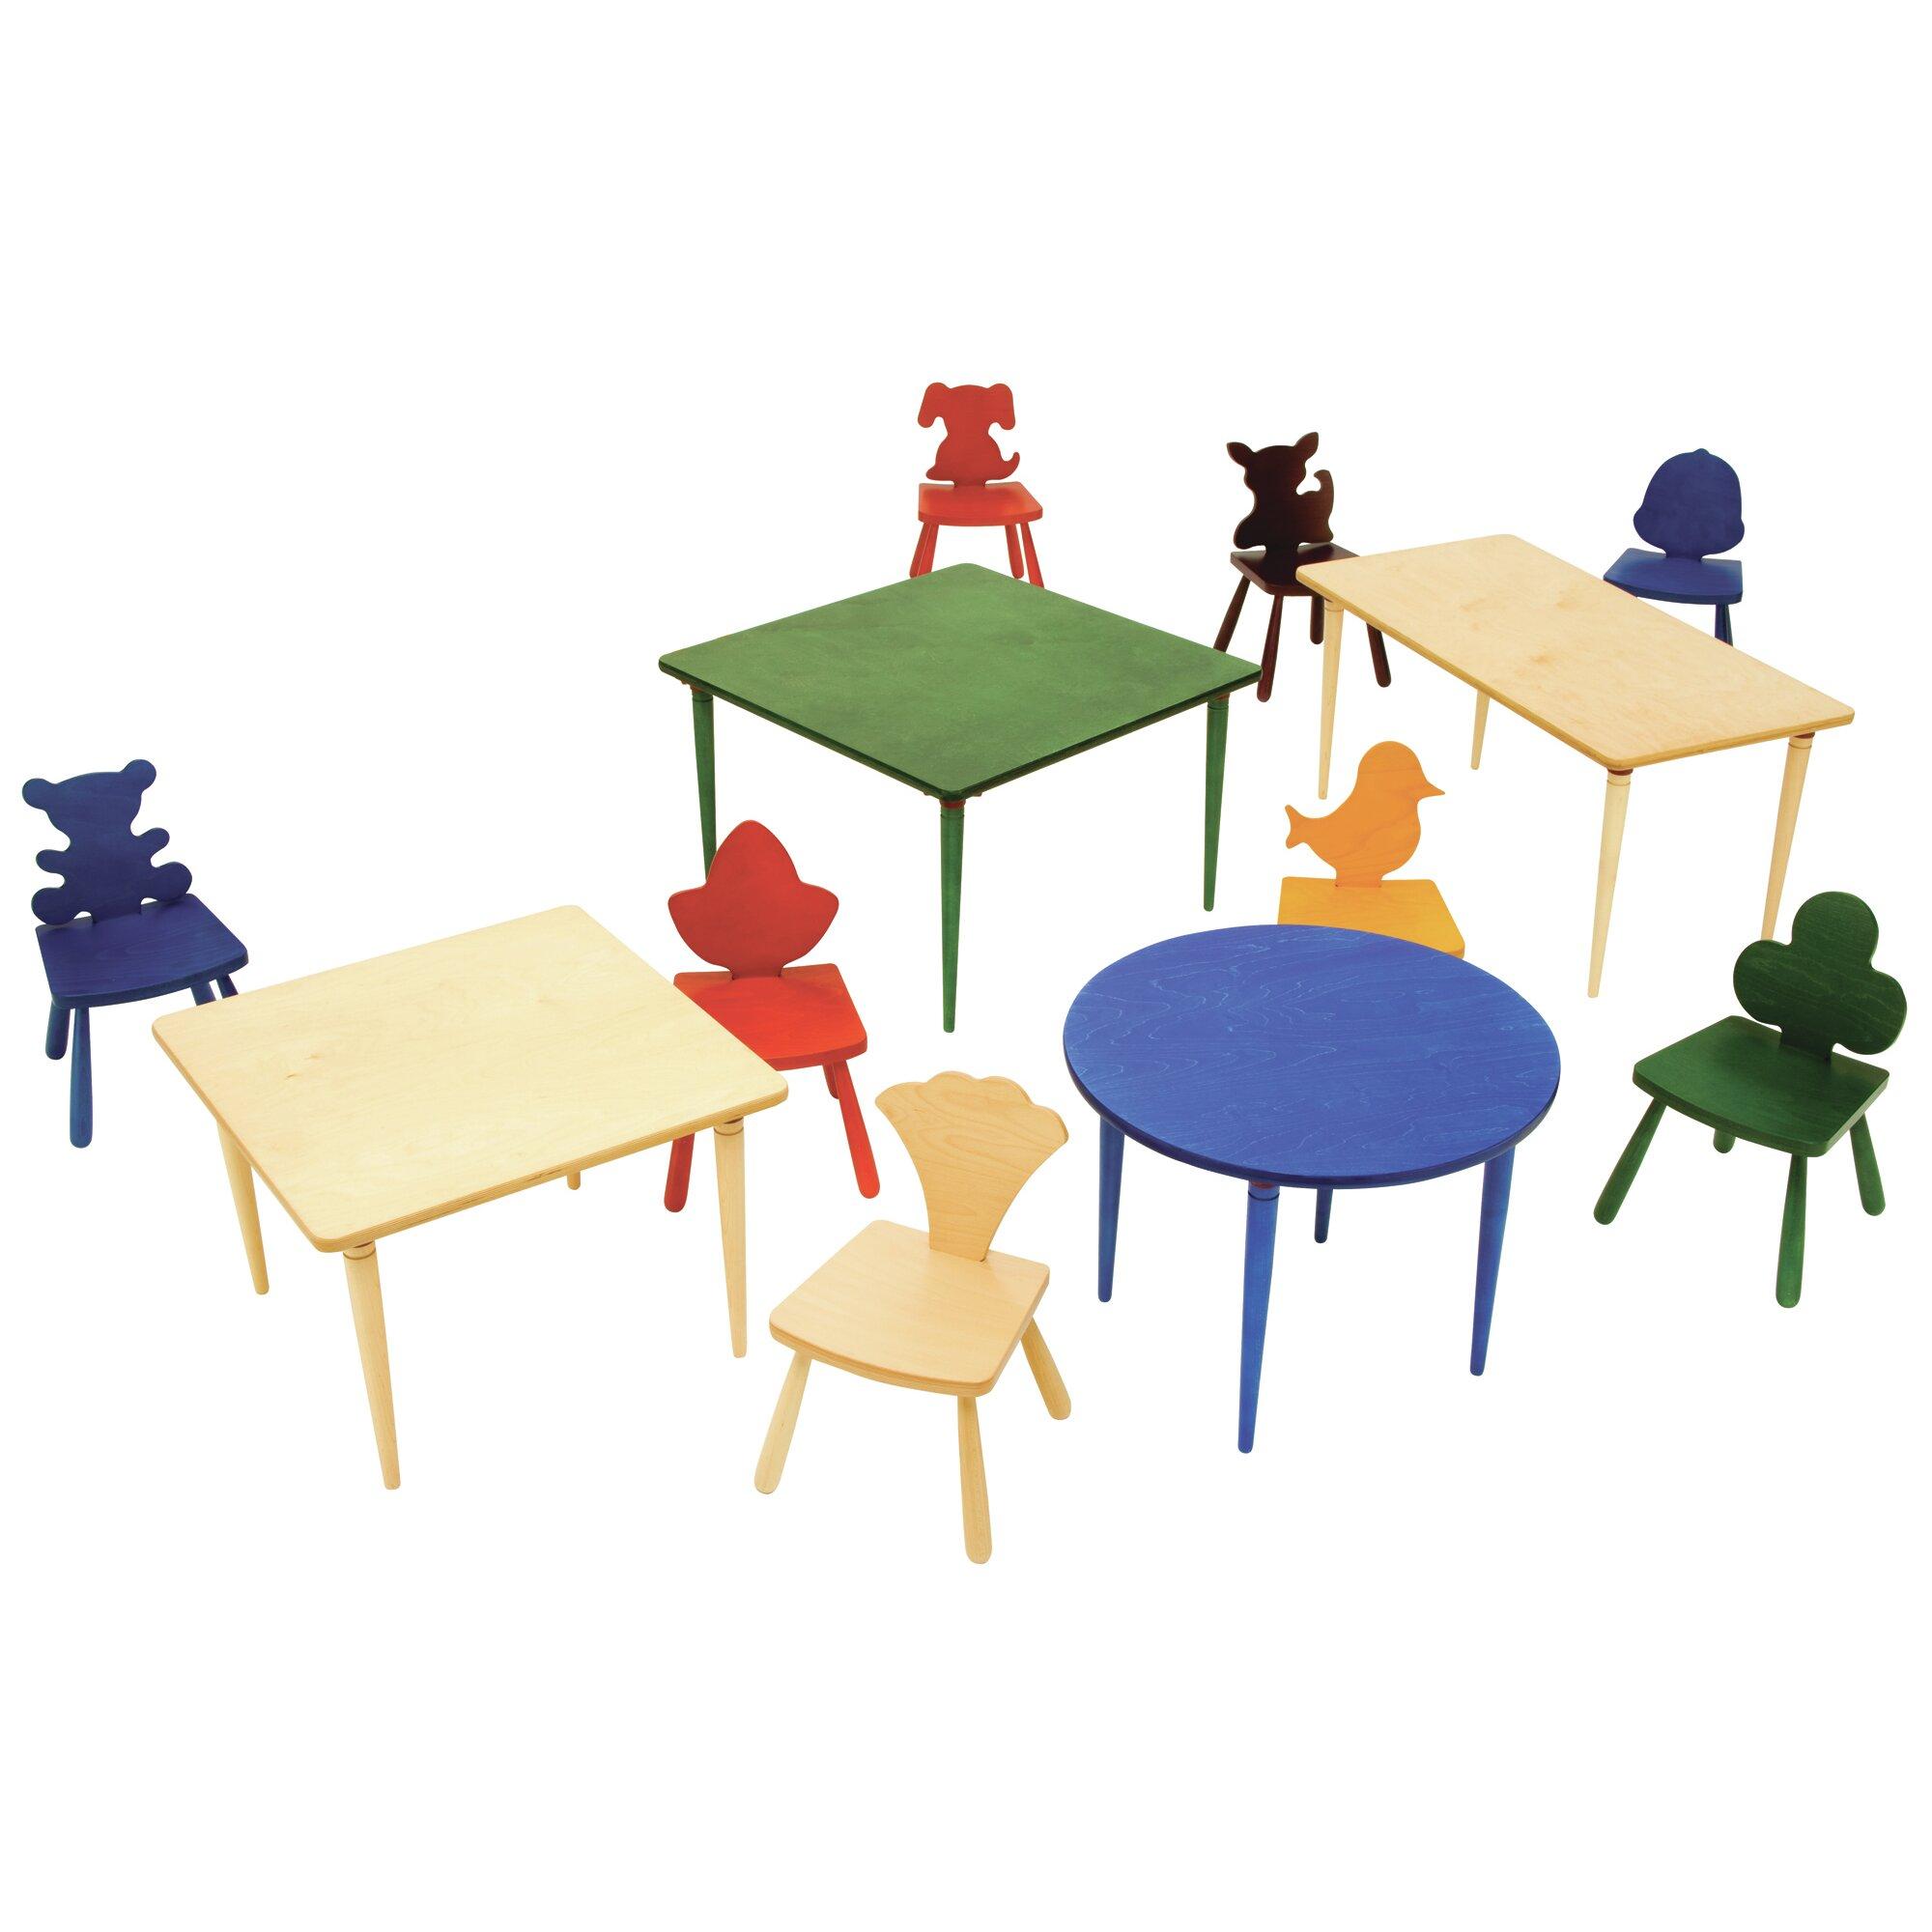 kids square arts and crafts table wayfair supply. Black Bedroom Furniture Sets. Home Design Ideas